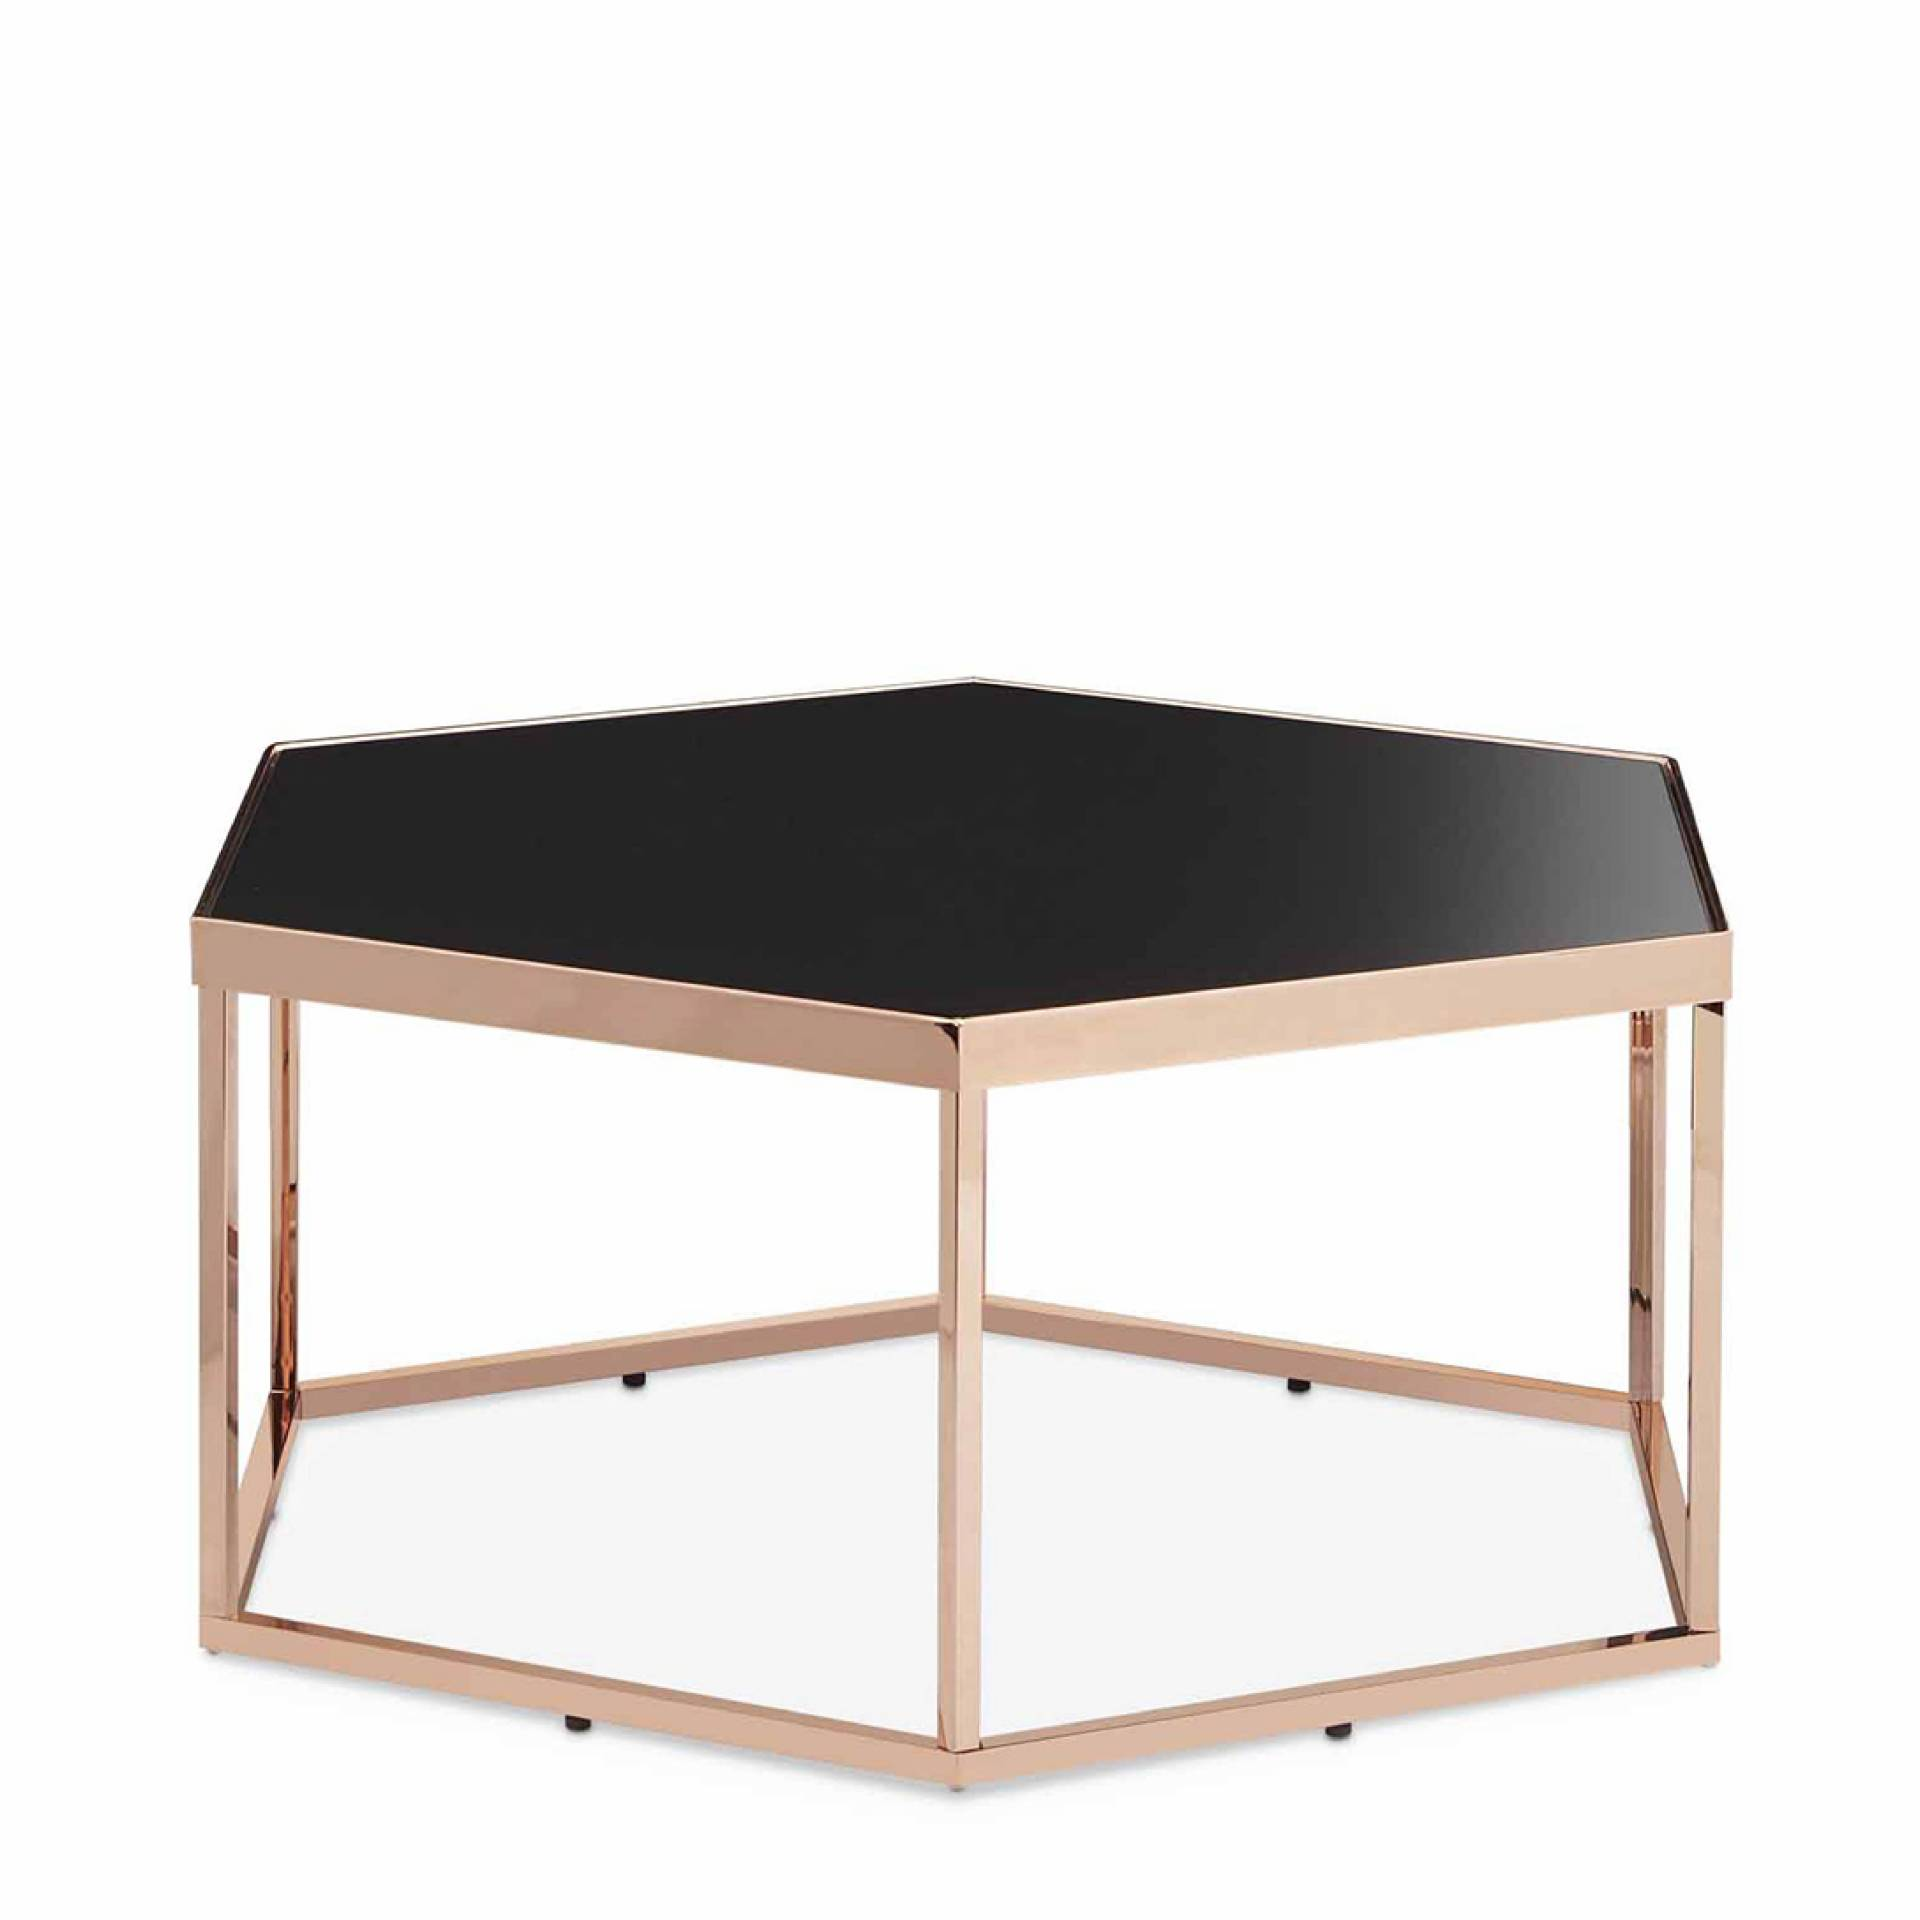 table basse hexagonale en verre noir fabricants de. Black Bedroom Furniture Sets. Home Design Ideas